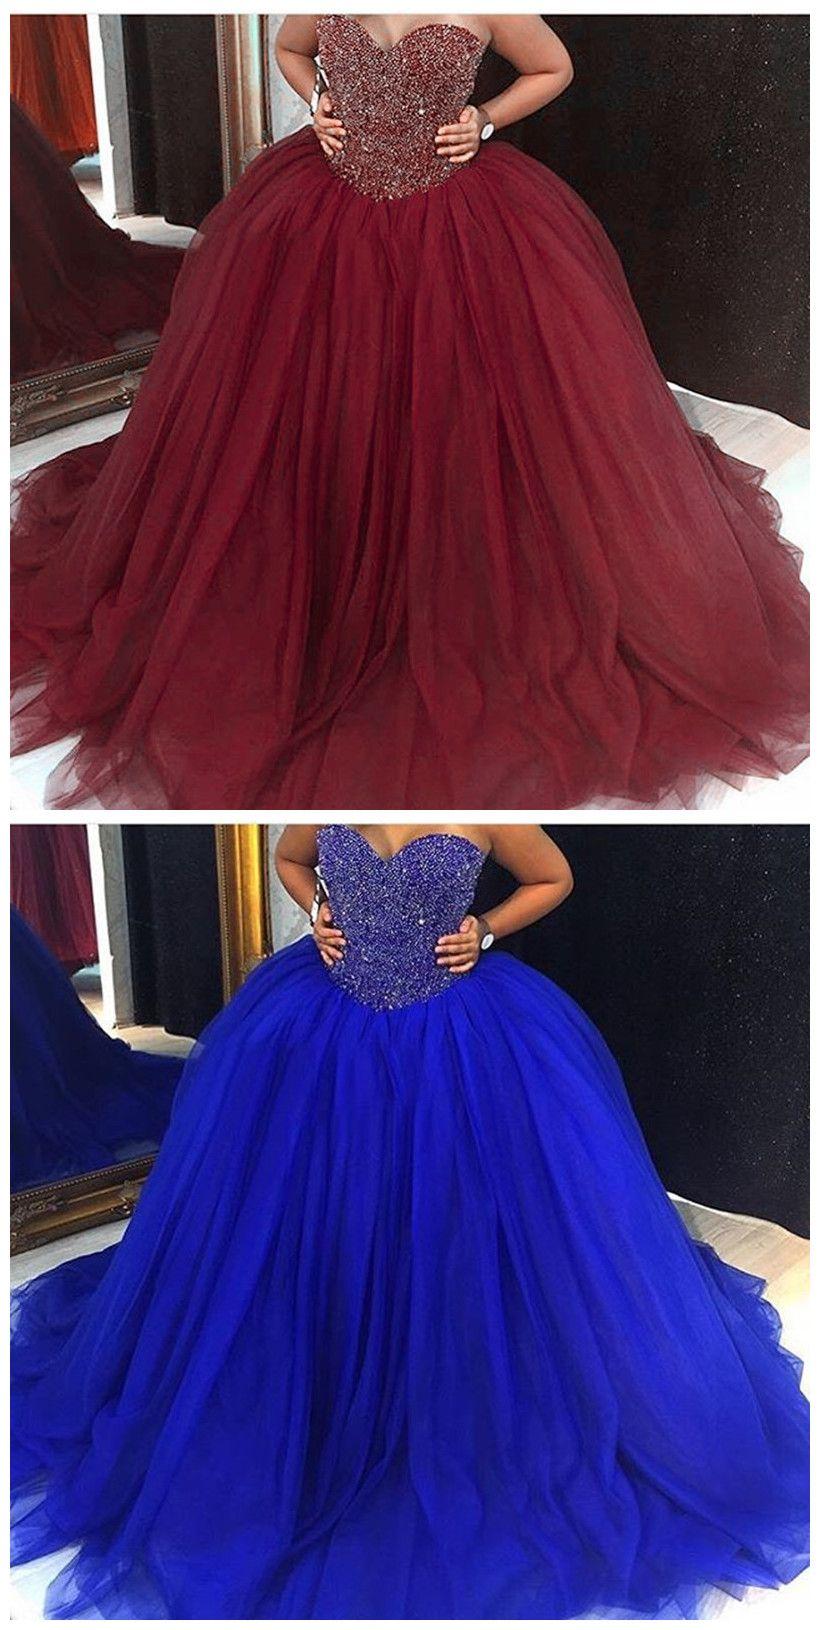 New arrival prom dressmodest prom dresssparkly burgundy prom